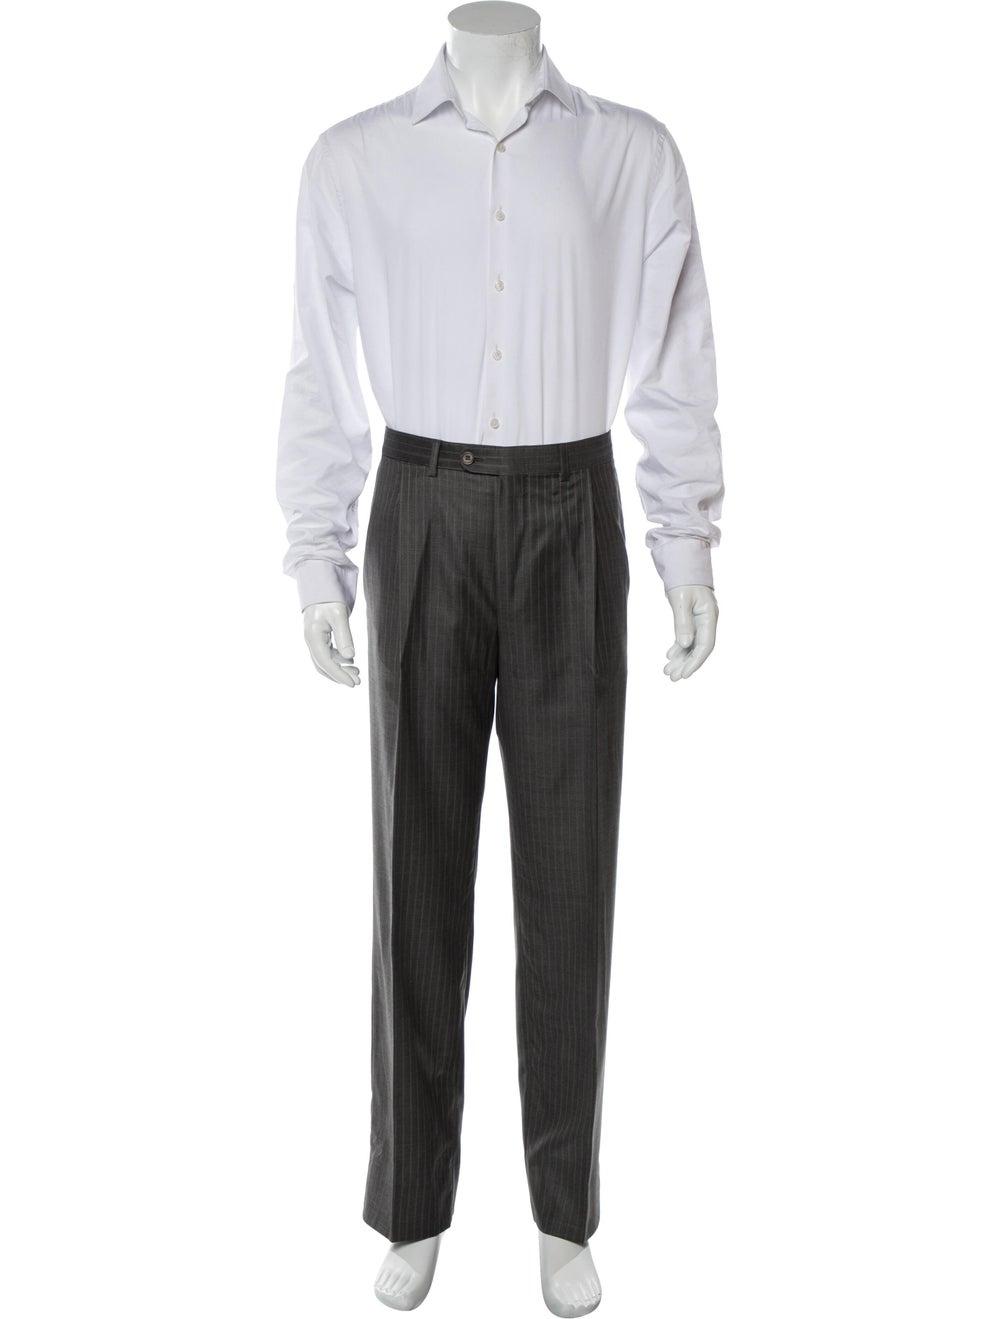 Ermenegildo Zegna Pinstripe Two-Piece Suit navy - image 4